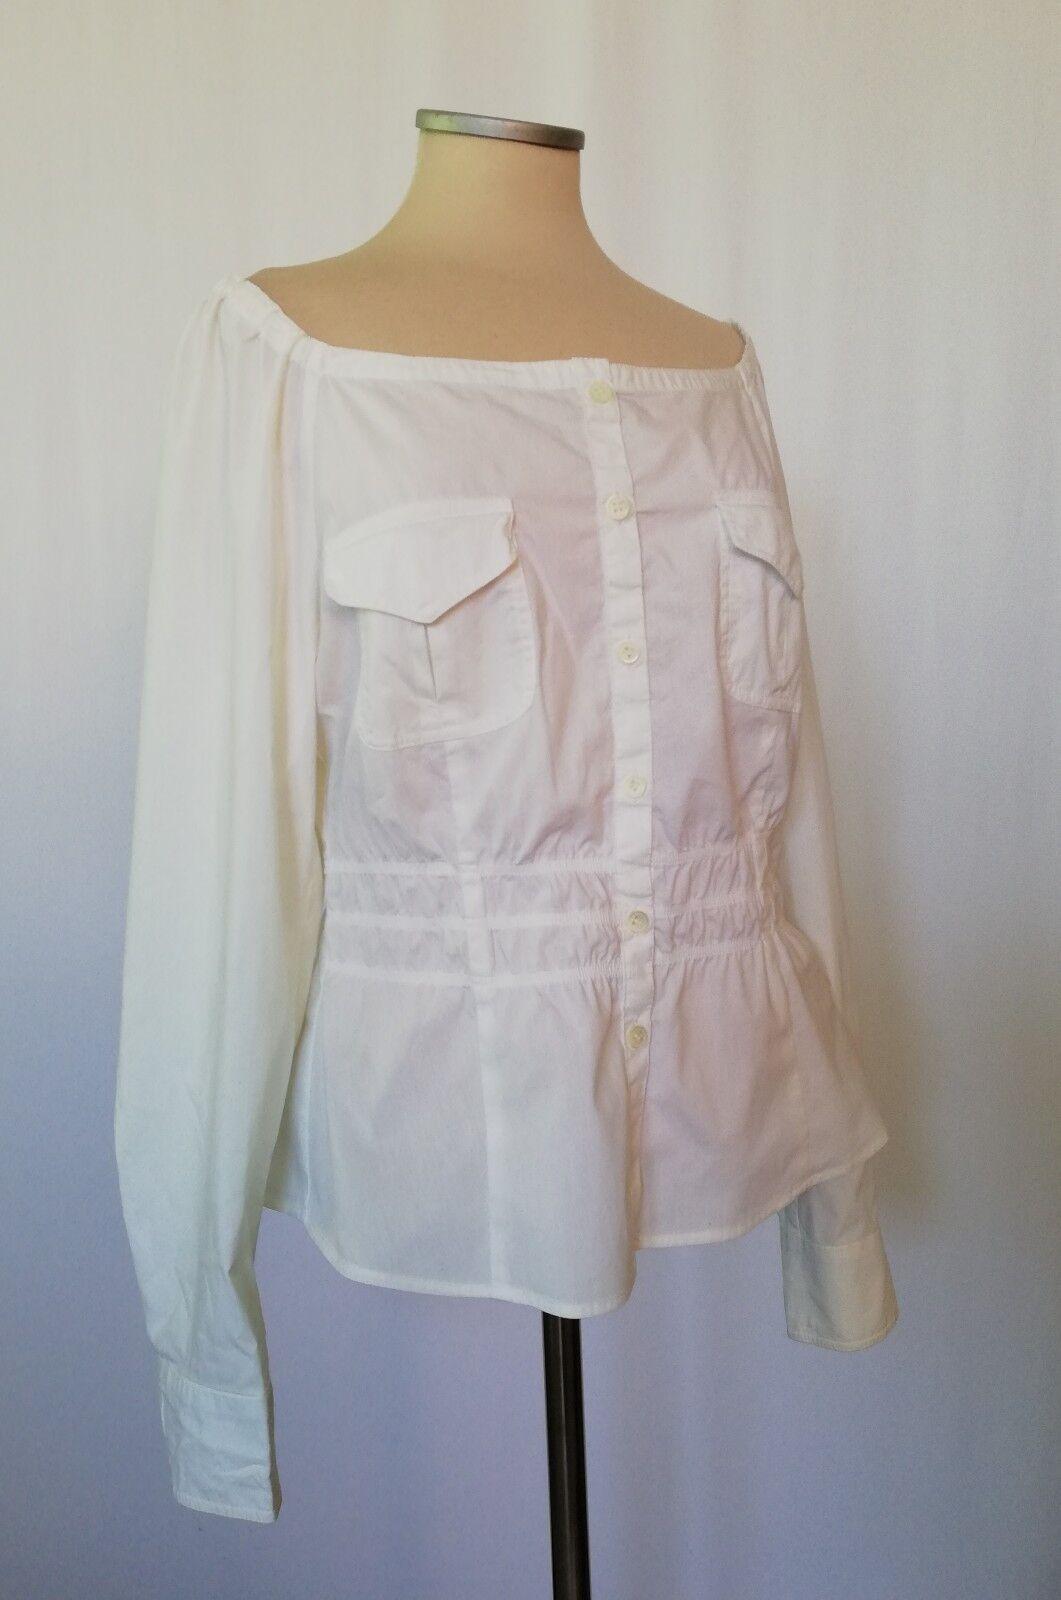 MARC CAIN Weiß Button Off Shoulder Top Blouse Shirt Cotton Größe5 UK14 US12 EU40